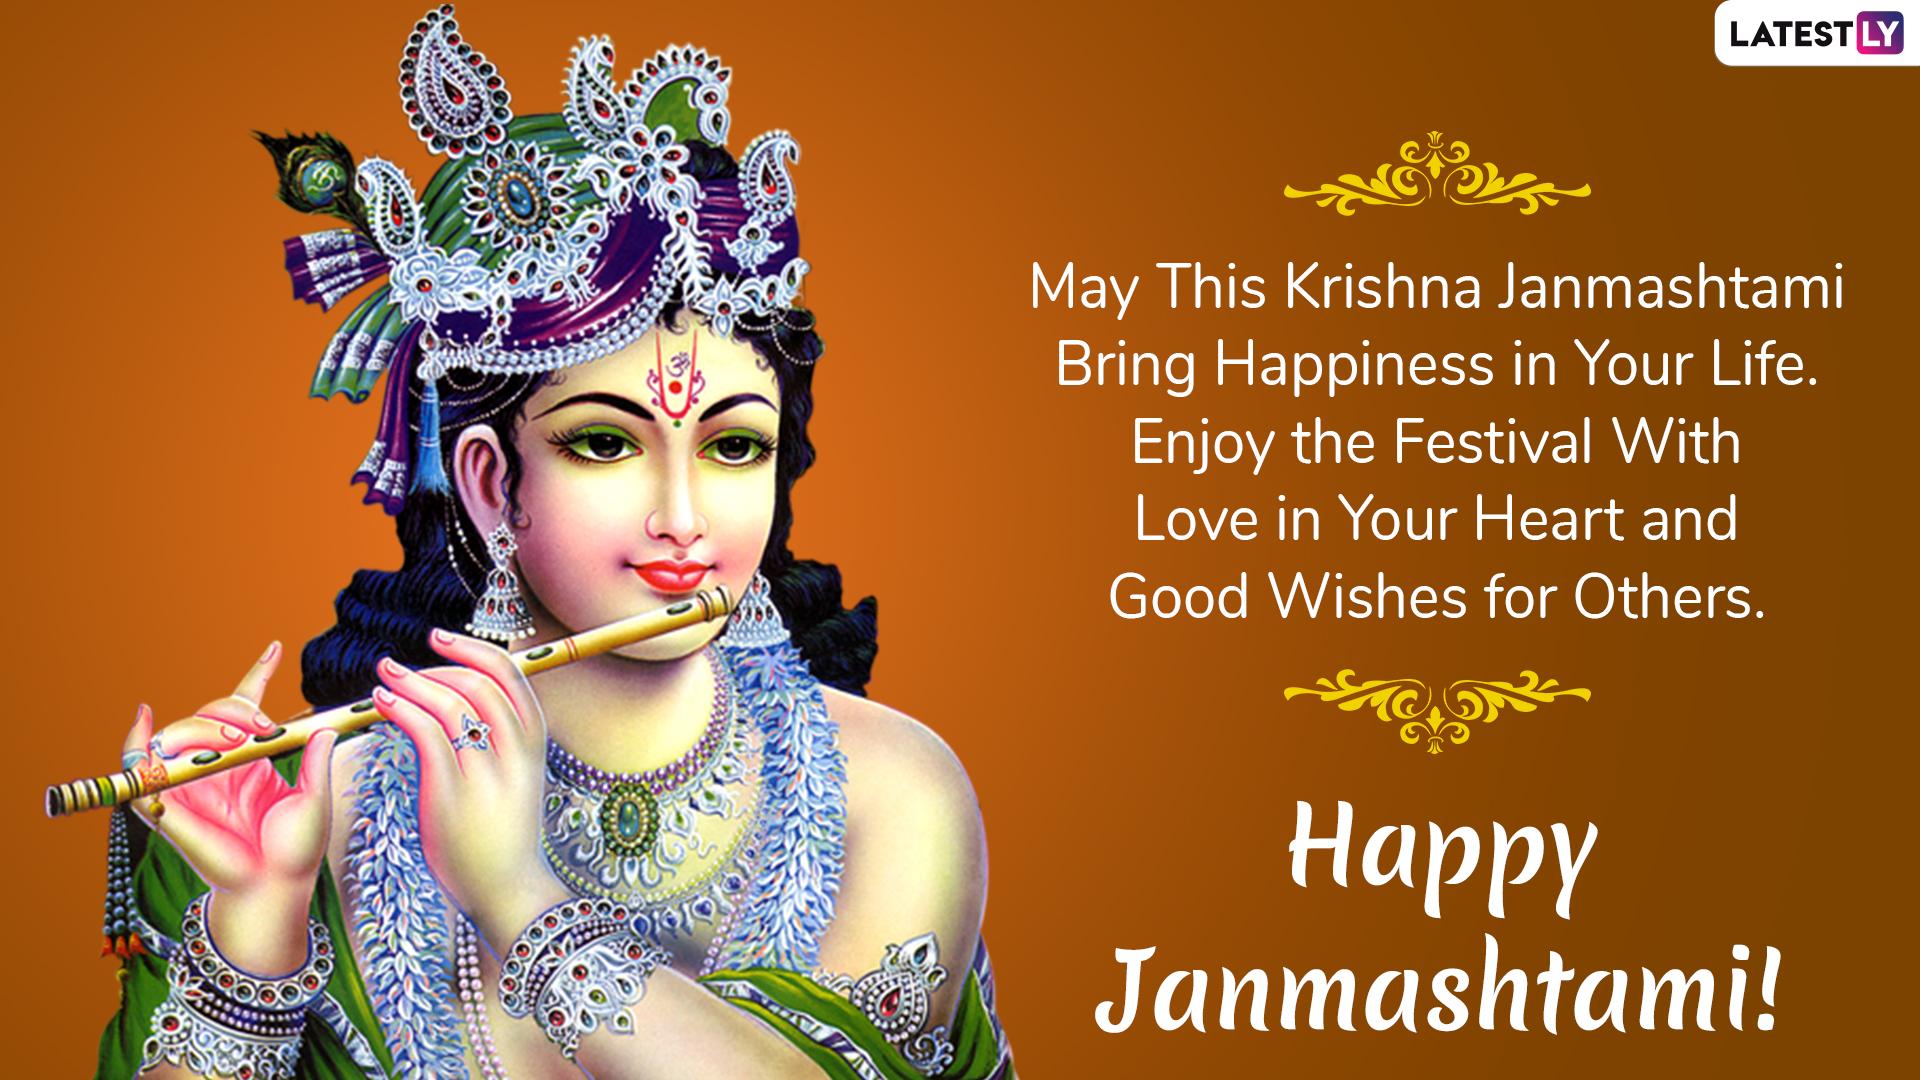 Happy Janmashtami 2019 Wishes And Messages Whatsapp